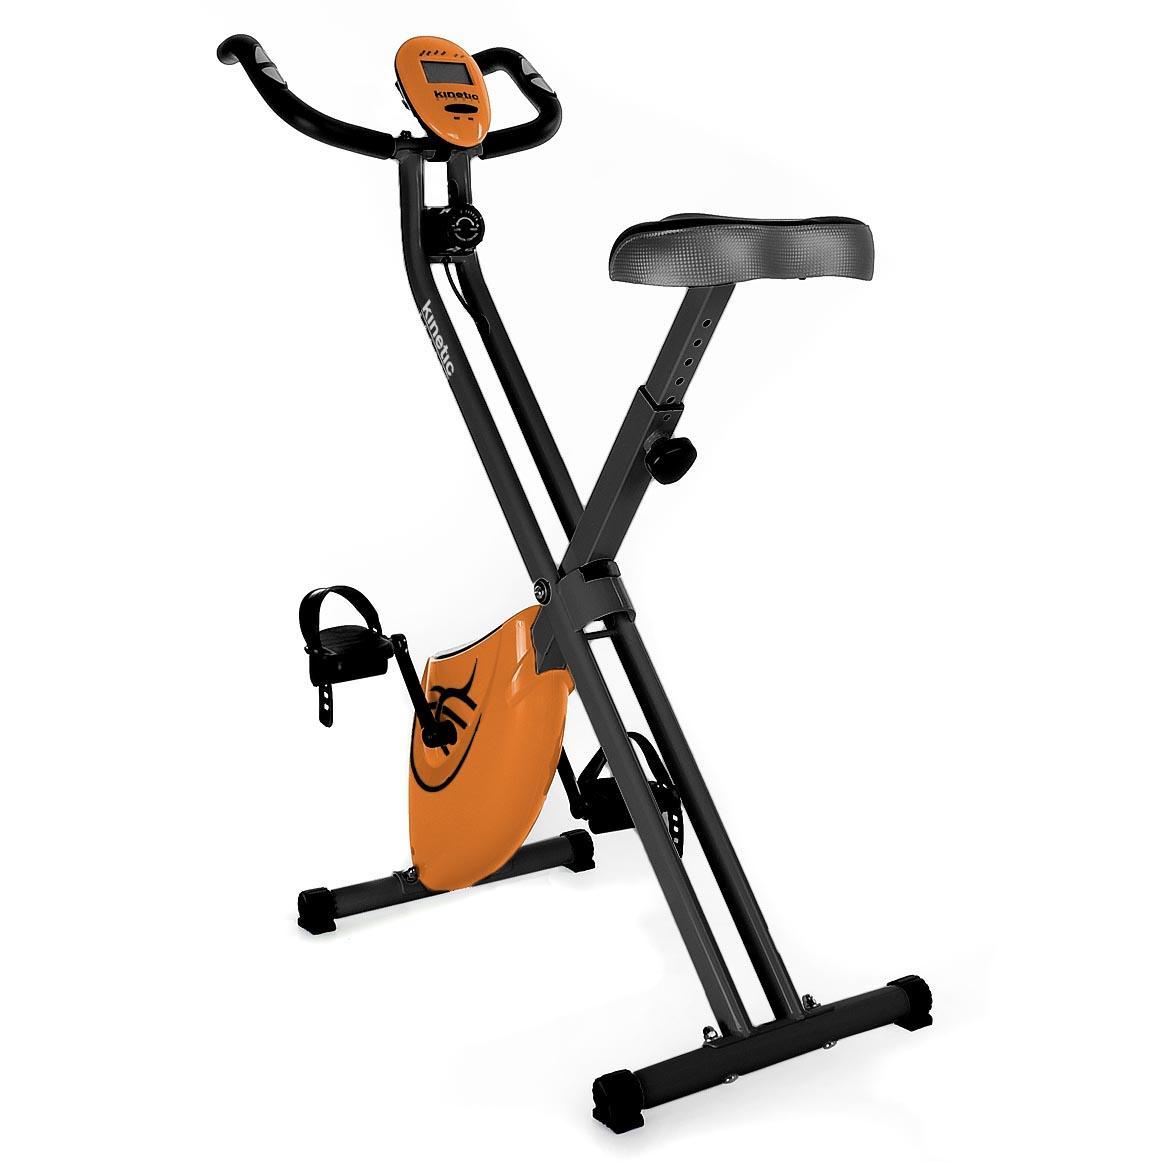 heimtrainer ergometer trimmrad fahrrad x bike fitnessger t cardio klappbar ebay. Black Bedroom Furniture Sets. Home Design Ideas